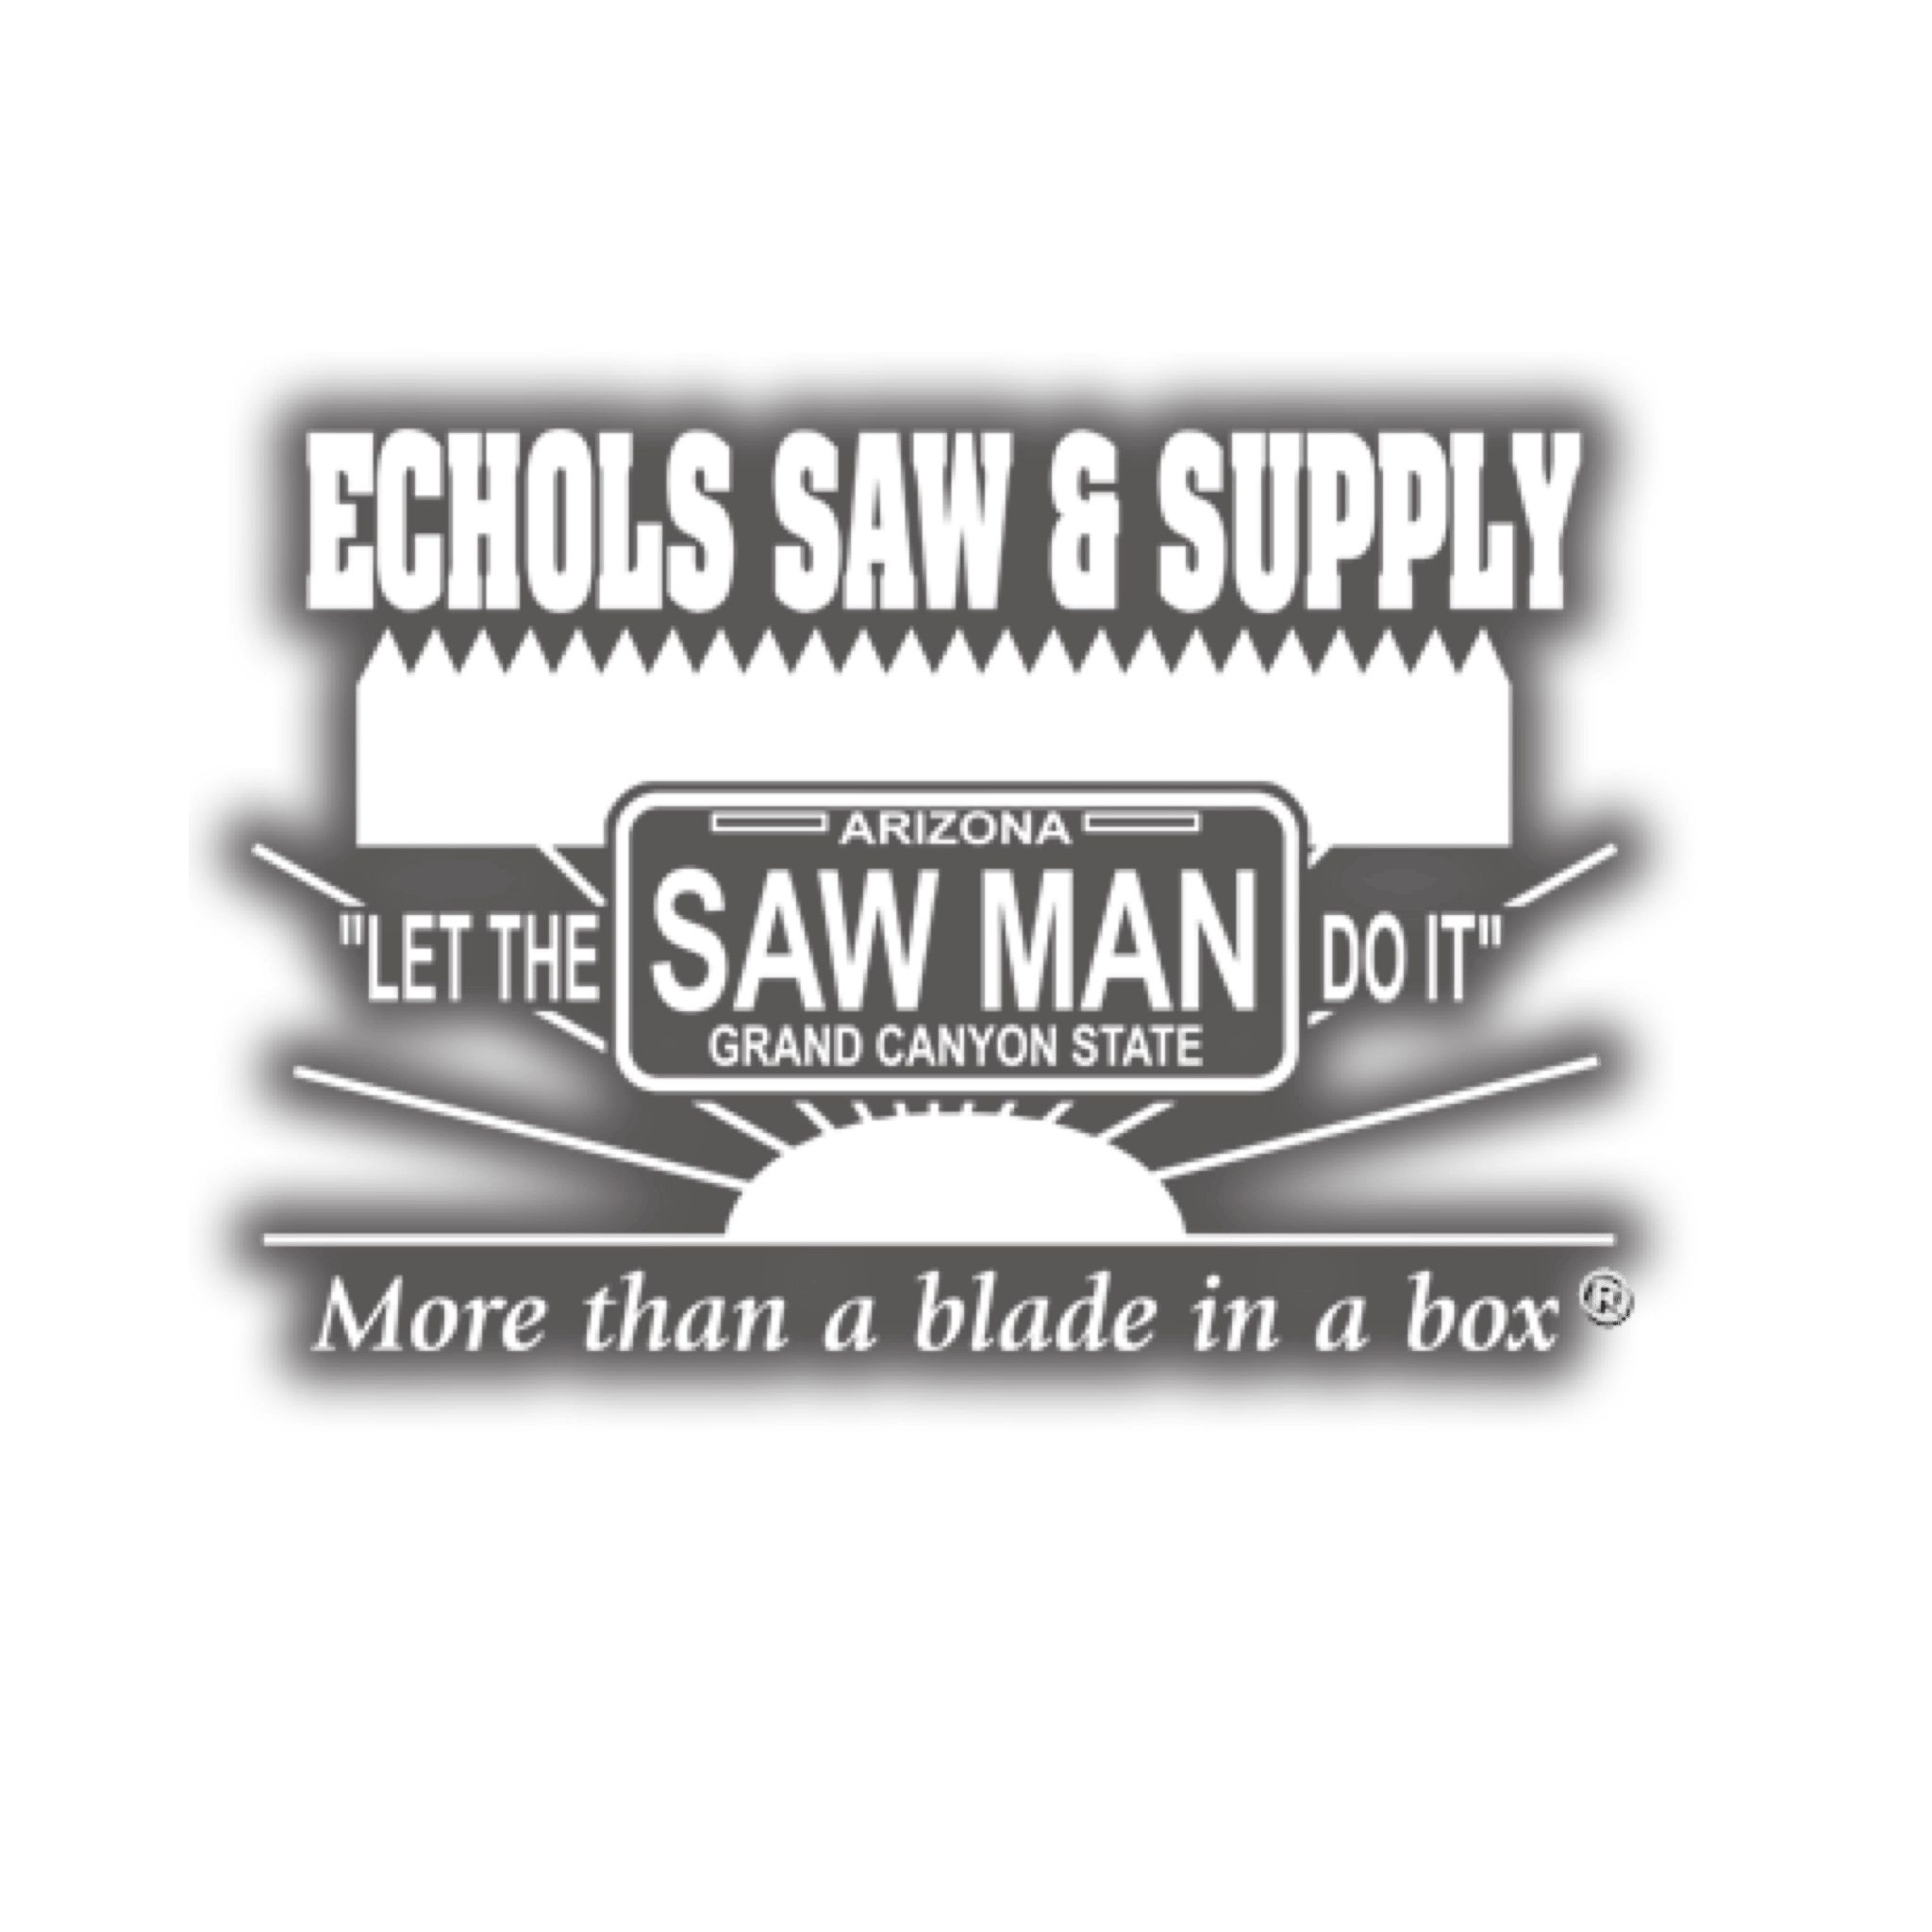 Echols Saw and Supply | Bandsaw Blades